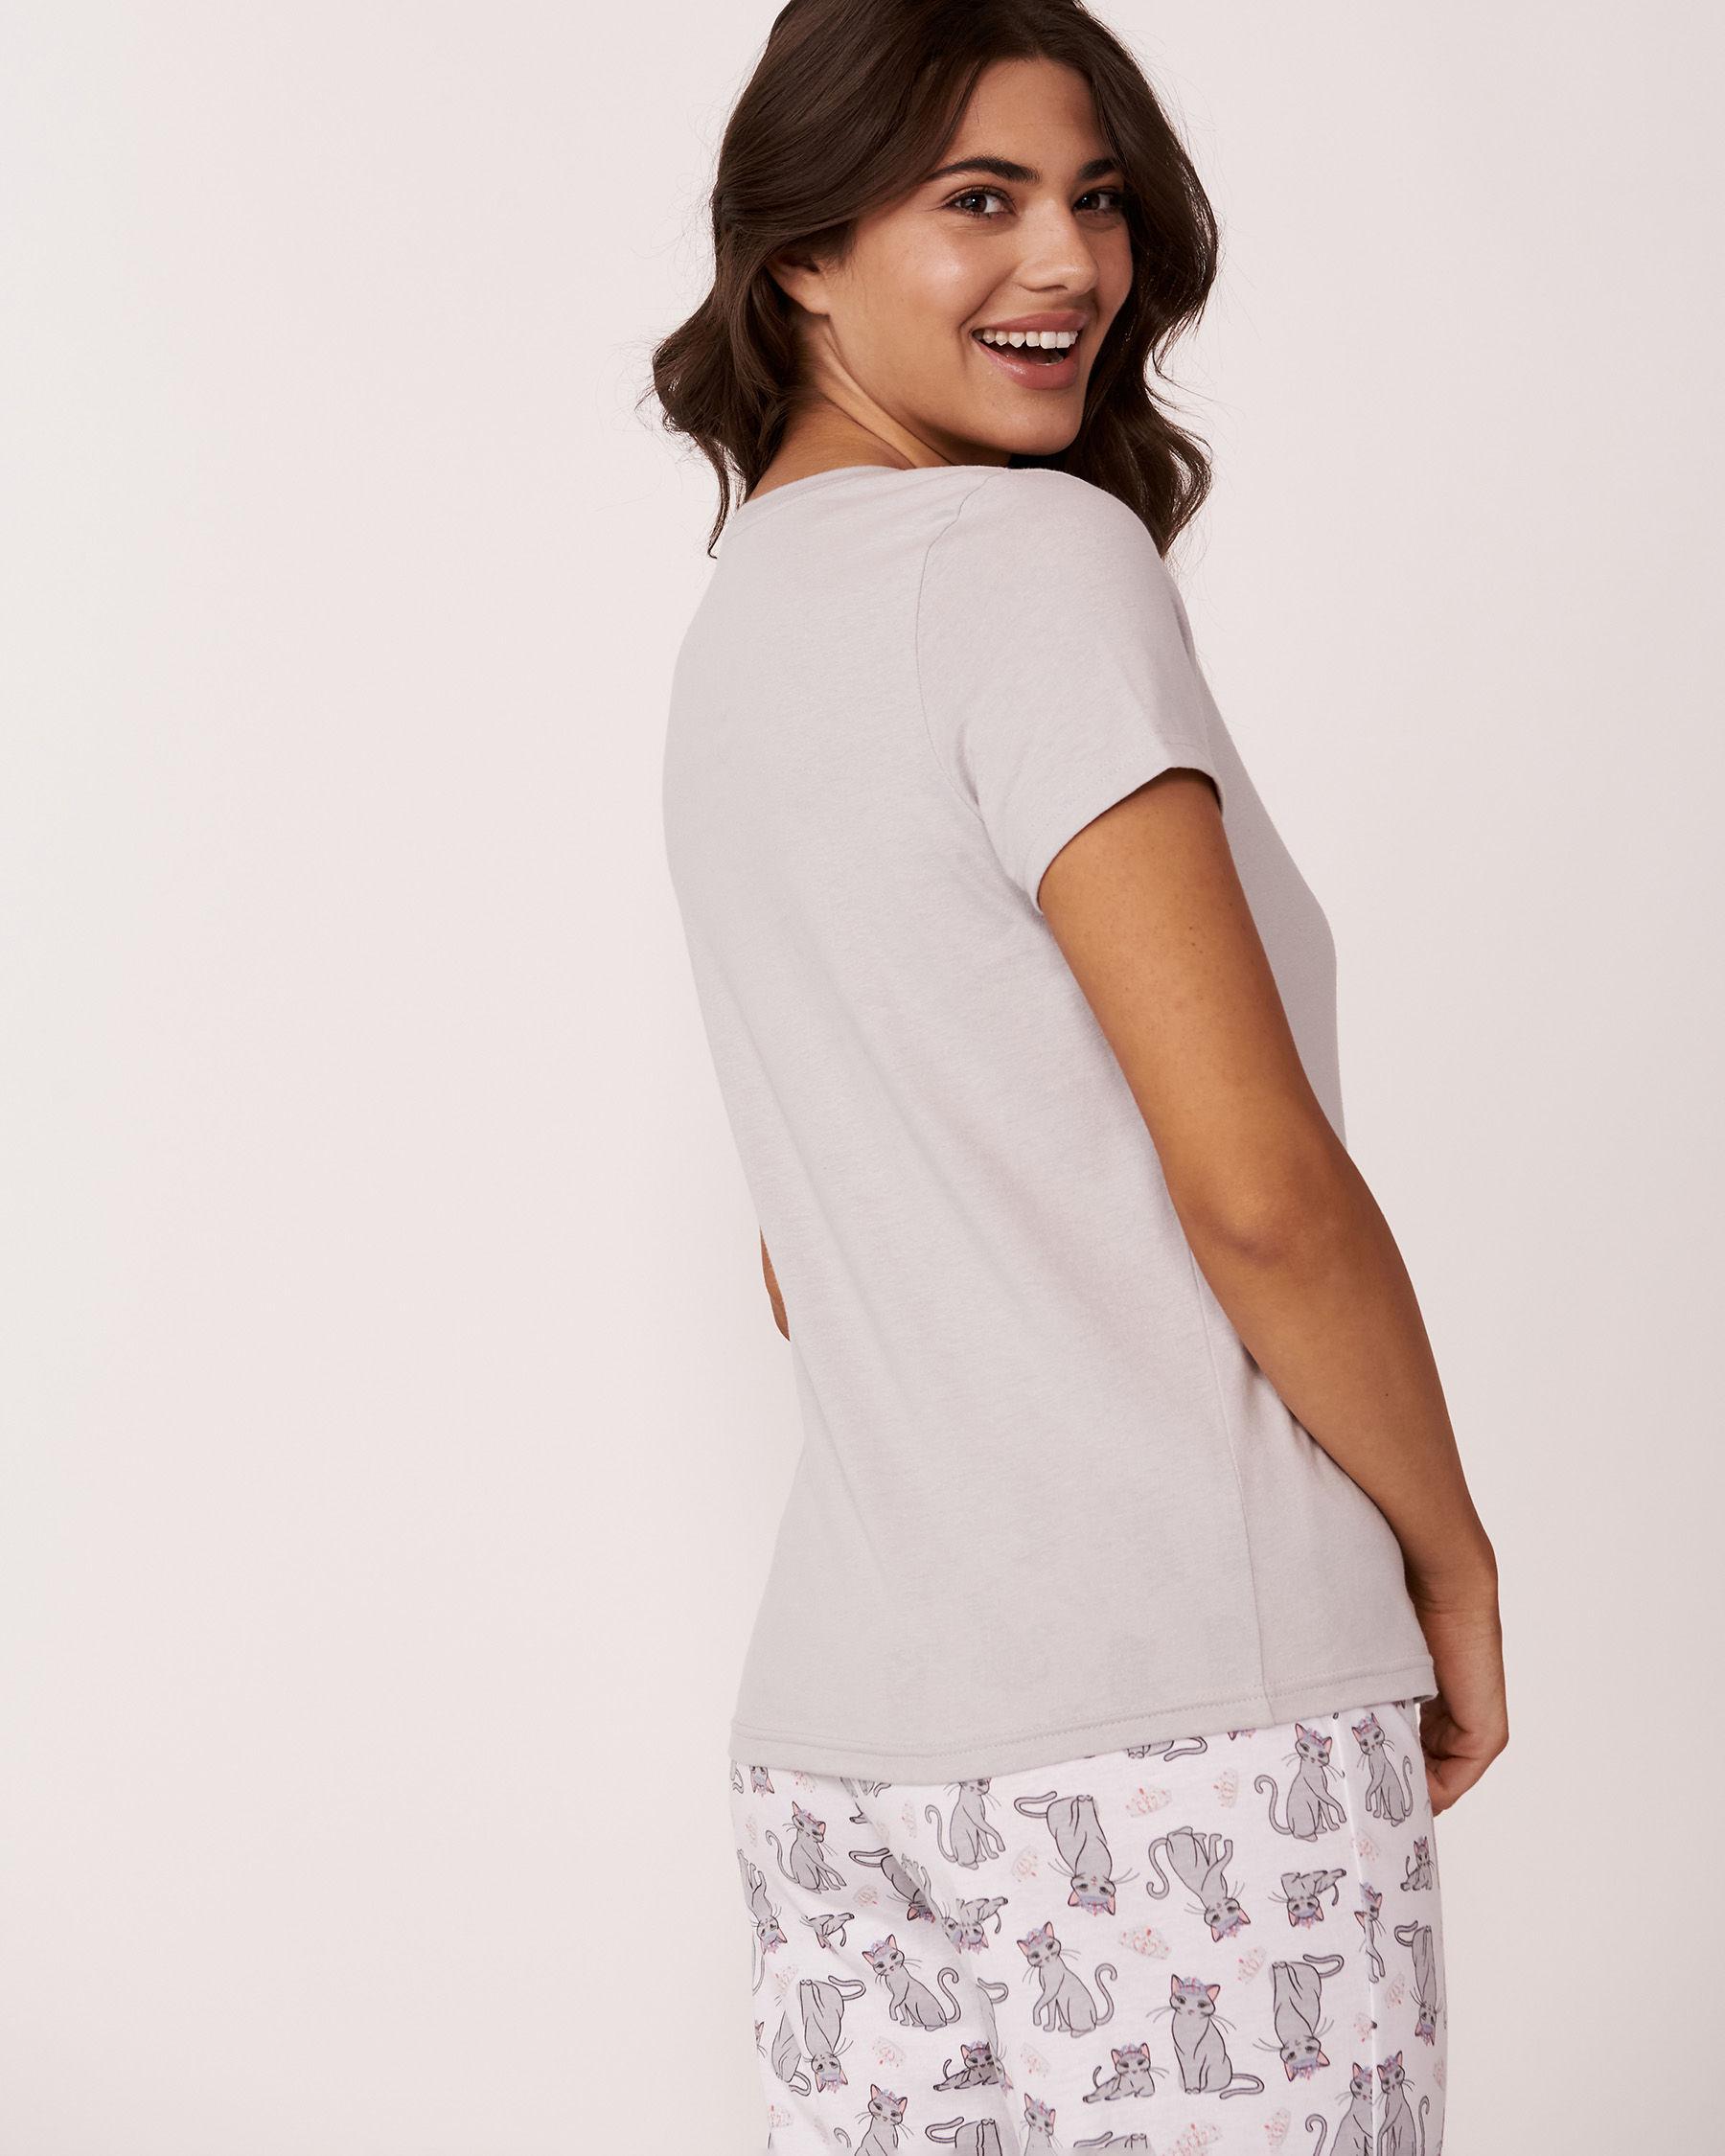 LA VIE EN ROSE V-neckline T-shirt Grey print 40100021 - View2